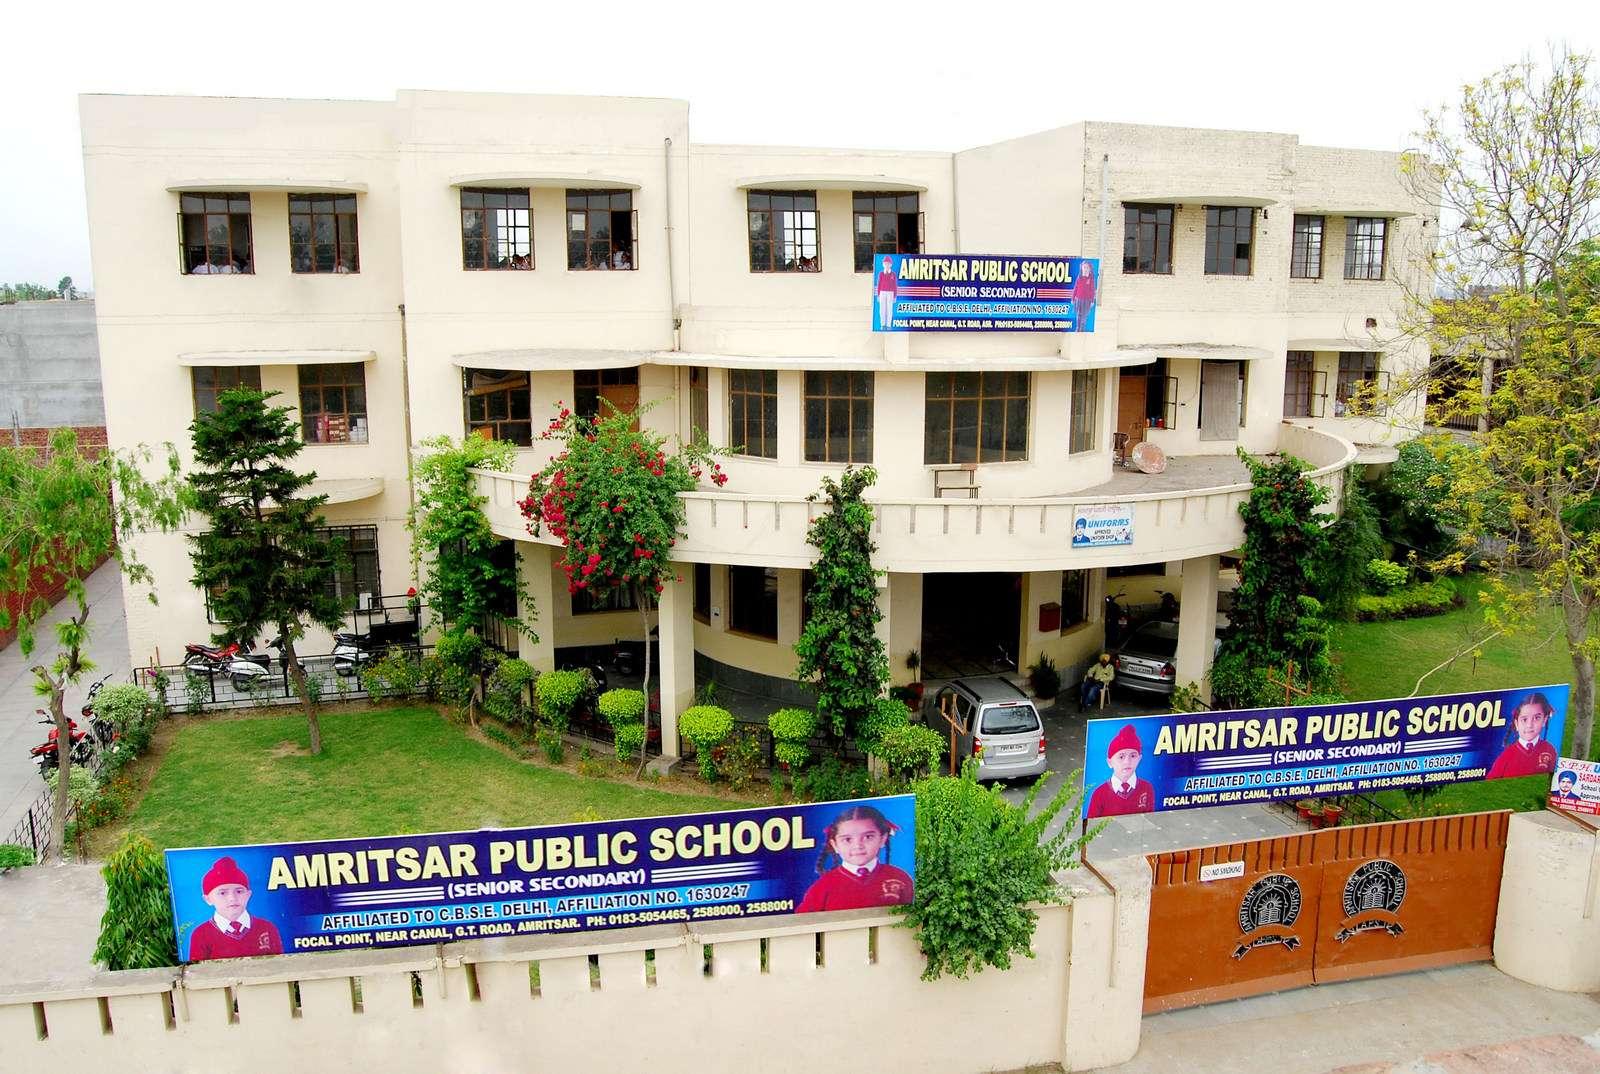 AMRITSAR PUBLIC SCHOOL FOCAL POINT ROAD NEAR CANAL G T ROAD AMRITSAR PUNJAB 1630247